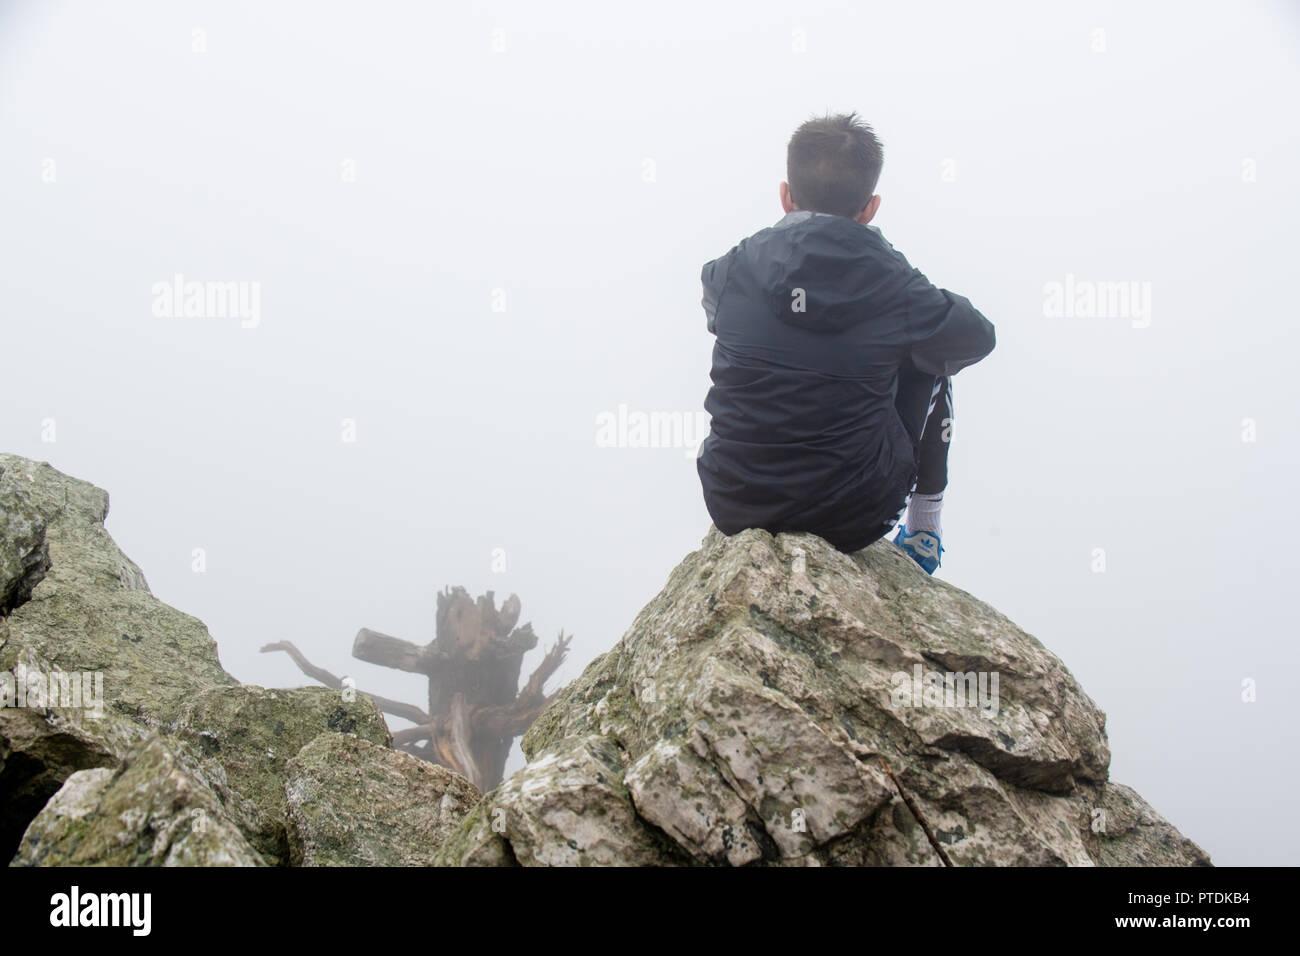 Teenager hiking / backpacking in the rain and dense fog on